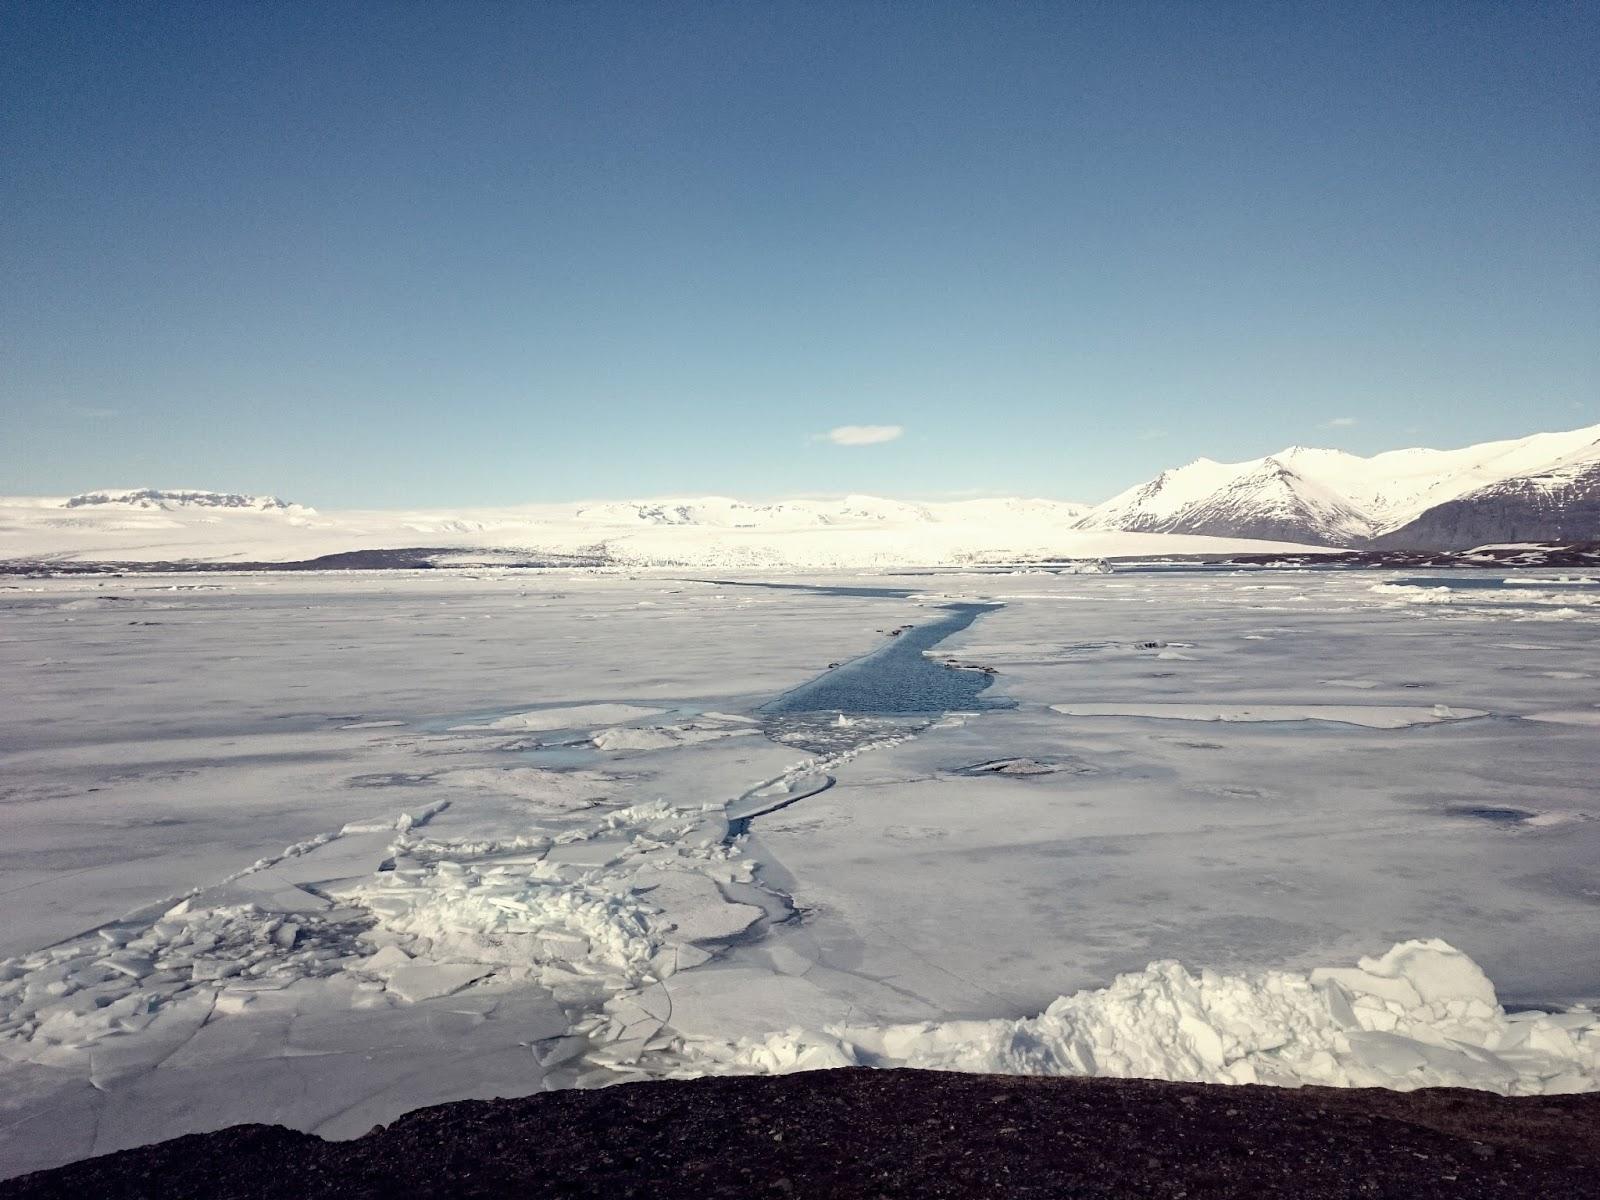 Laguna Lodowcowa, Islandia, panidorcia, blog o Islandii